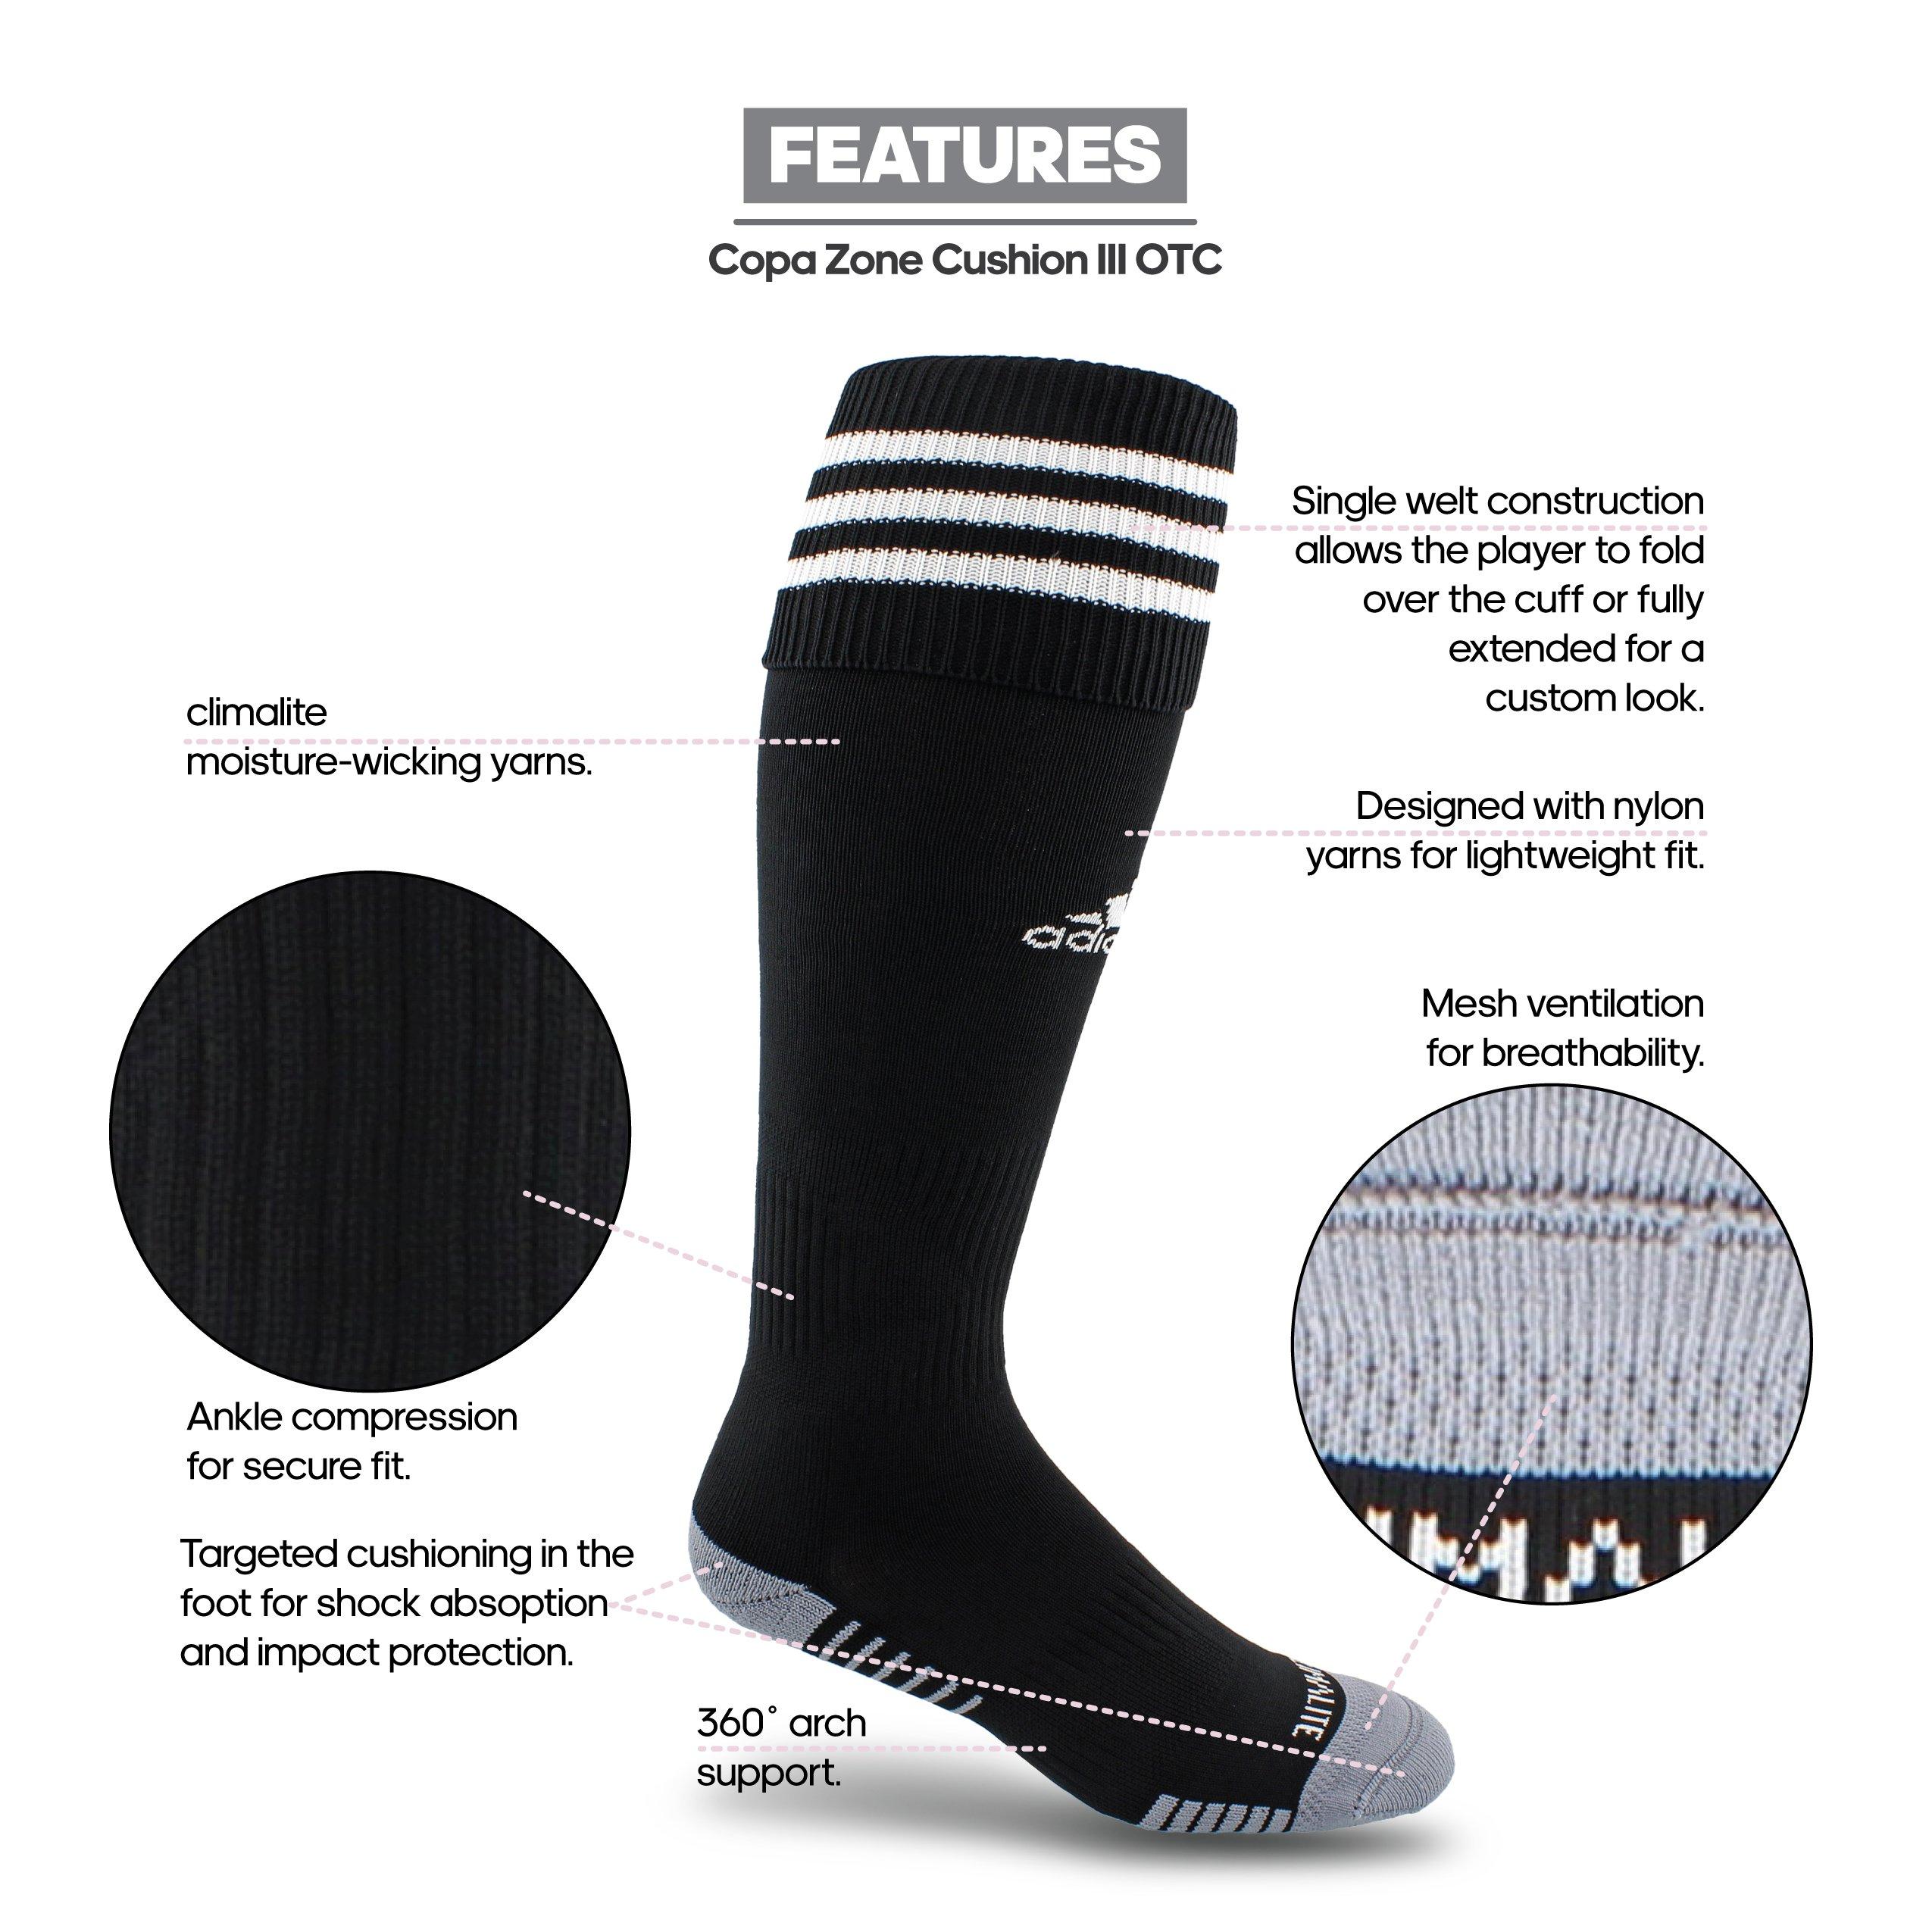 e67d0b497 adidas Copa Zone Cushion III Soccer Socks, Black/White, Size Large ...